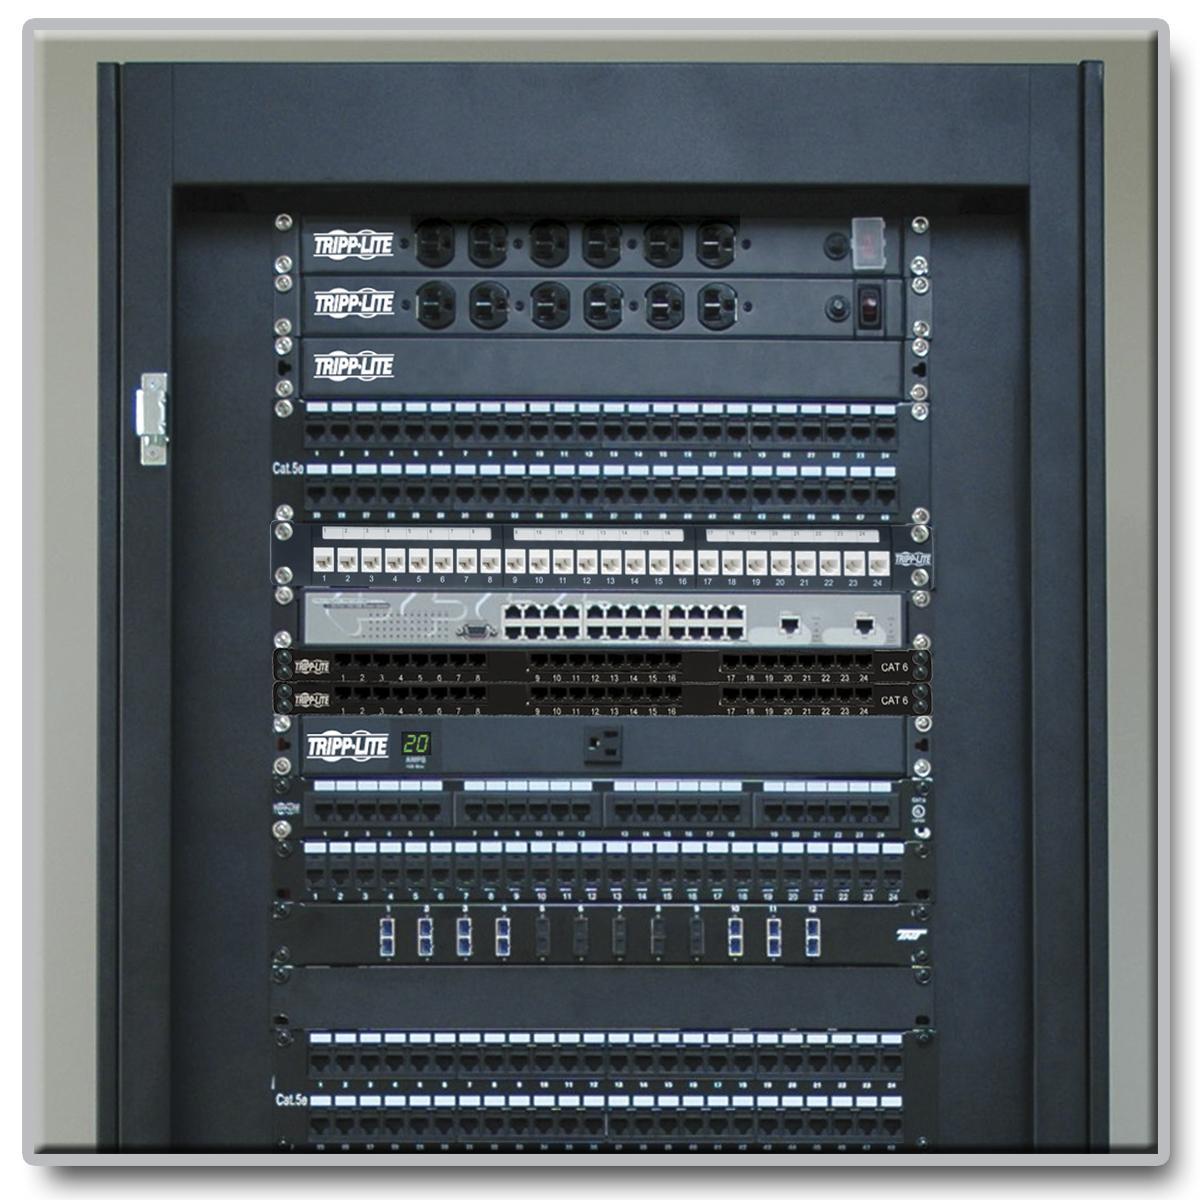 Tripp Lite N252 024 Hu 24 Port Cat6 05u Rm Patch Panel 568a B Taa 110 Type Compatible